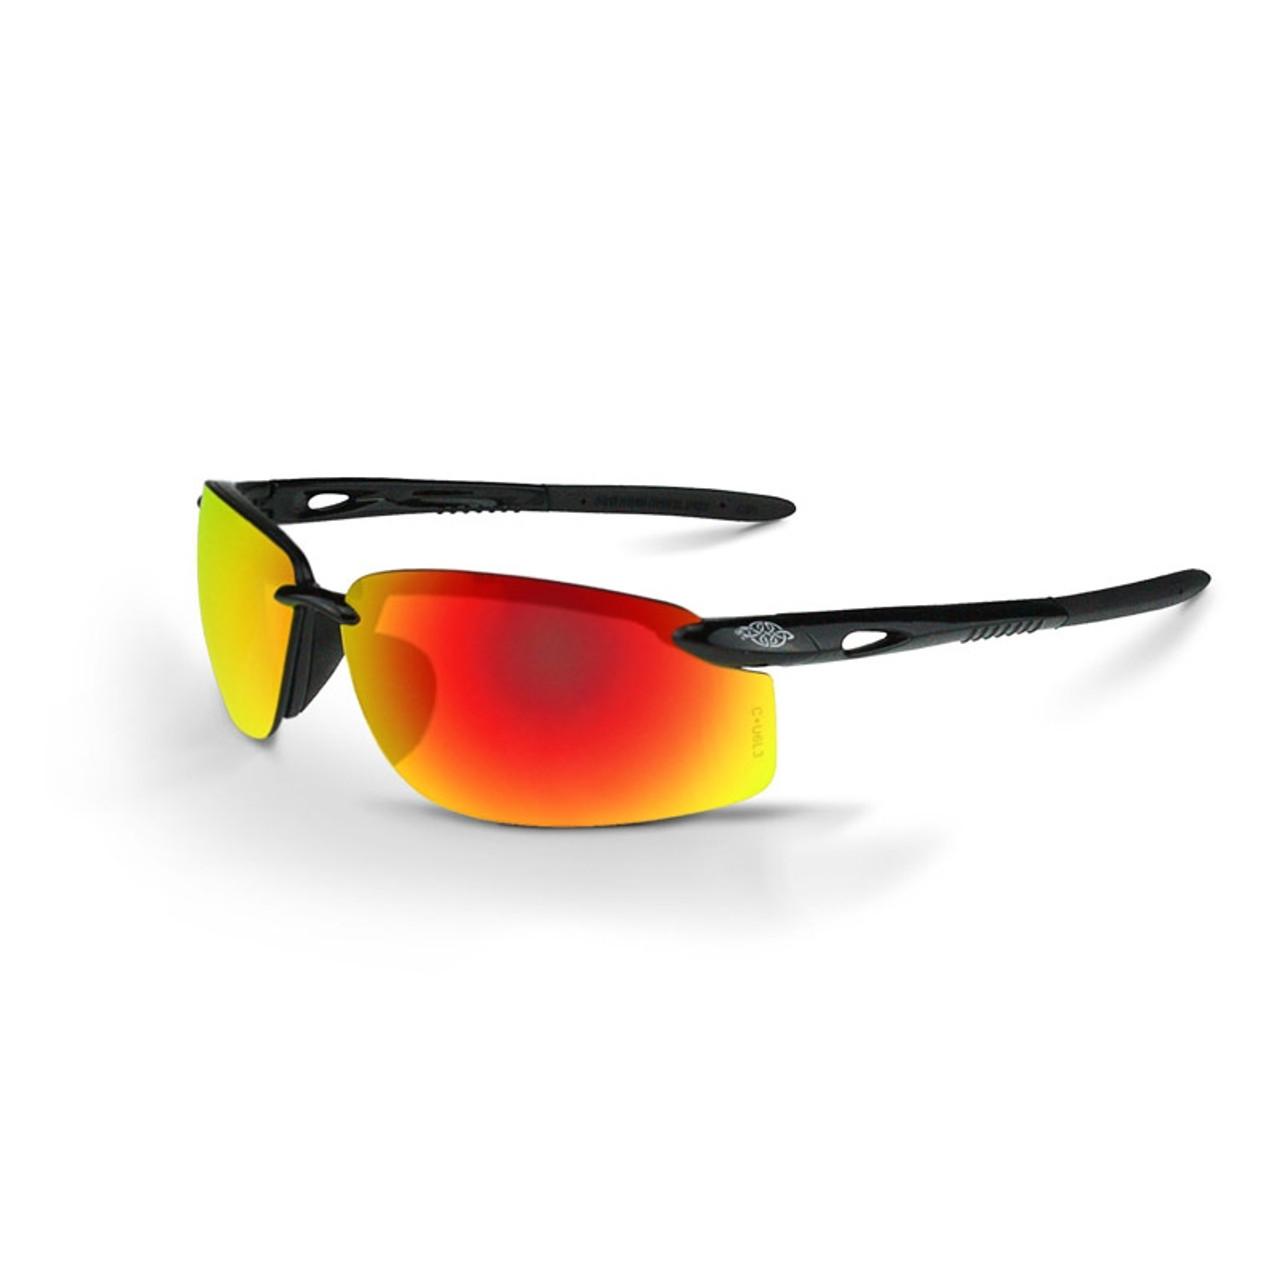 c1b4fea54ad Crossfire ES5W 12620W Safety Glasses - Fire Mirror Lens - Box of 12